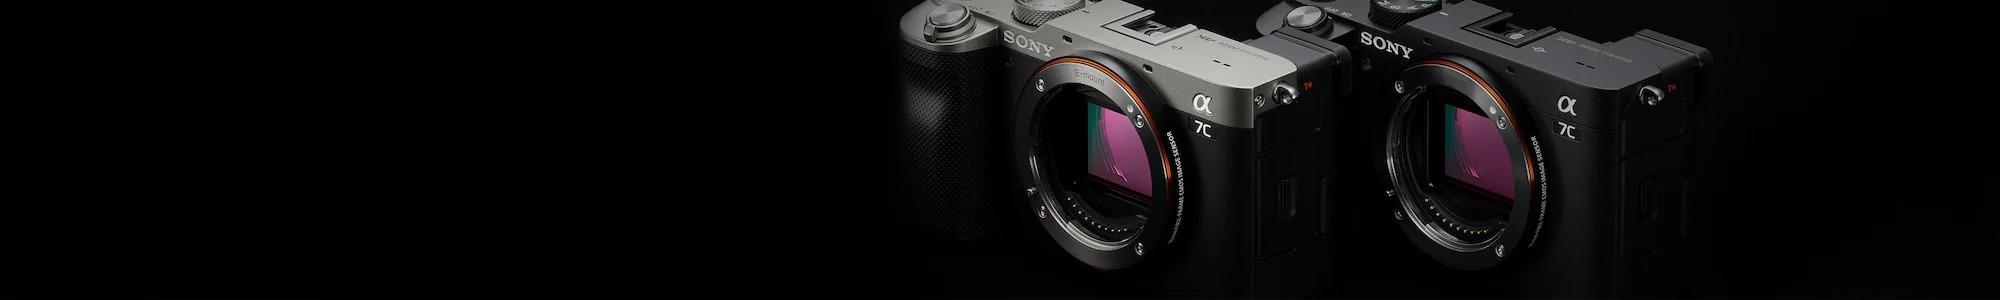 Sony ILCE-7C - Máy ảnh full-frame nhỏ gọn Alpha 7C